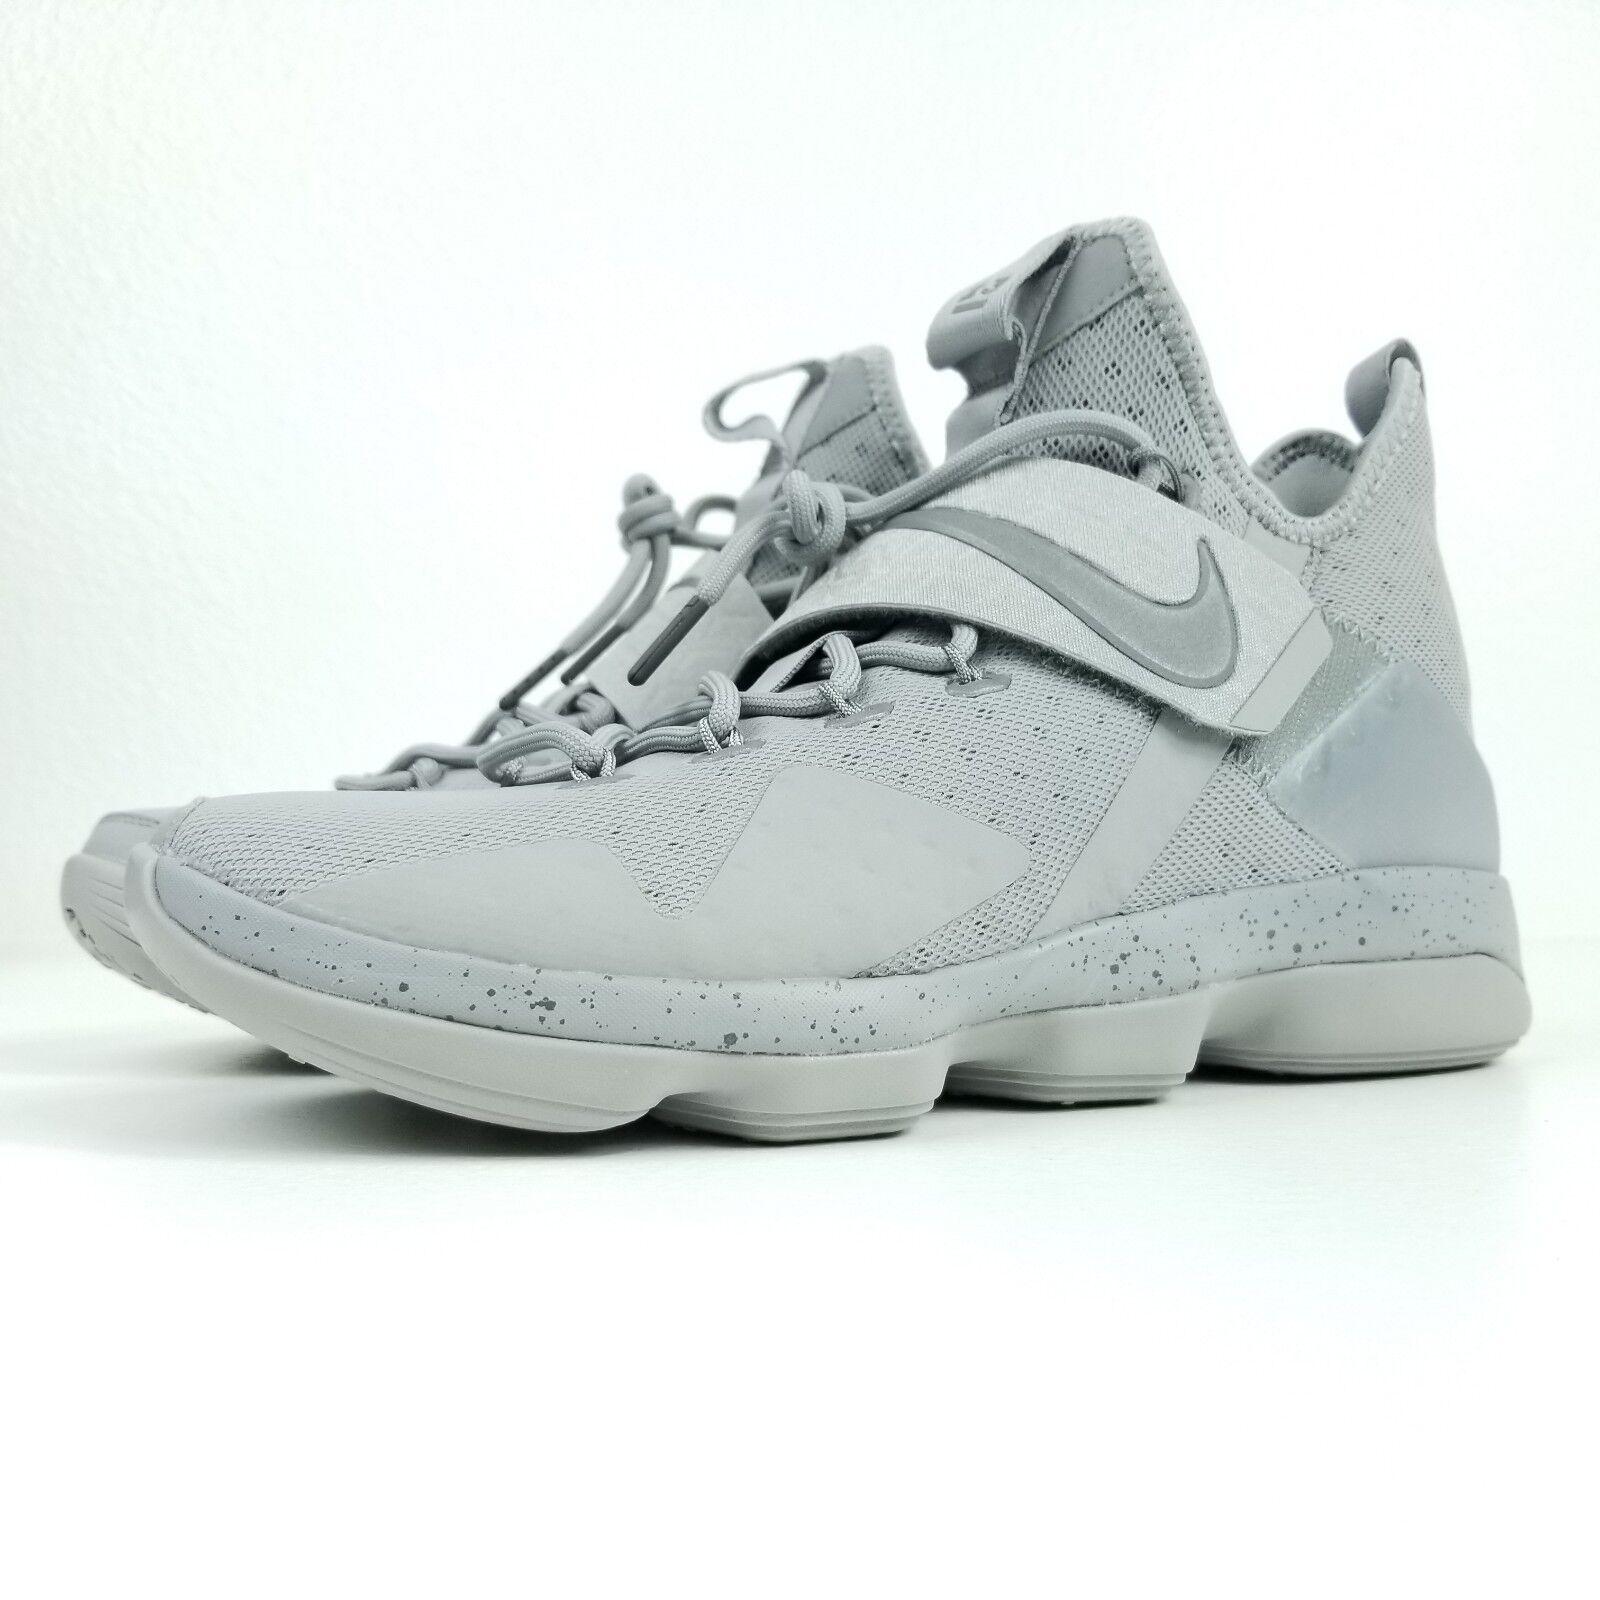 NIKE Lebron James XIV Mens Sz 10.5 Basketball Shoes Gray Silver 852405 007